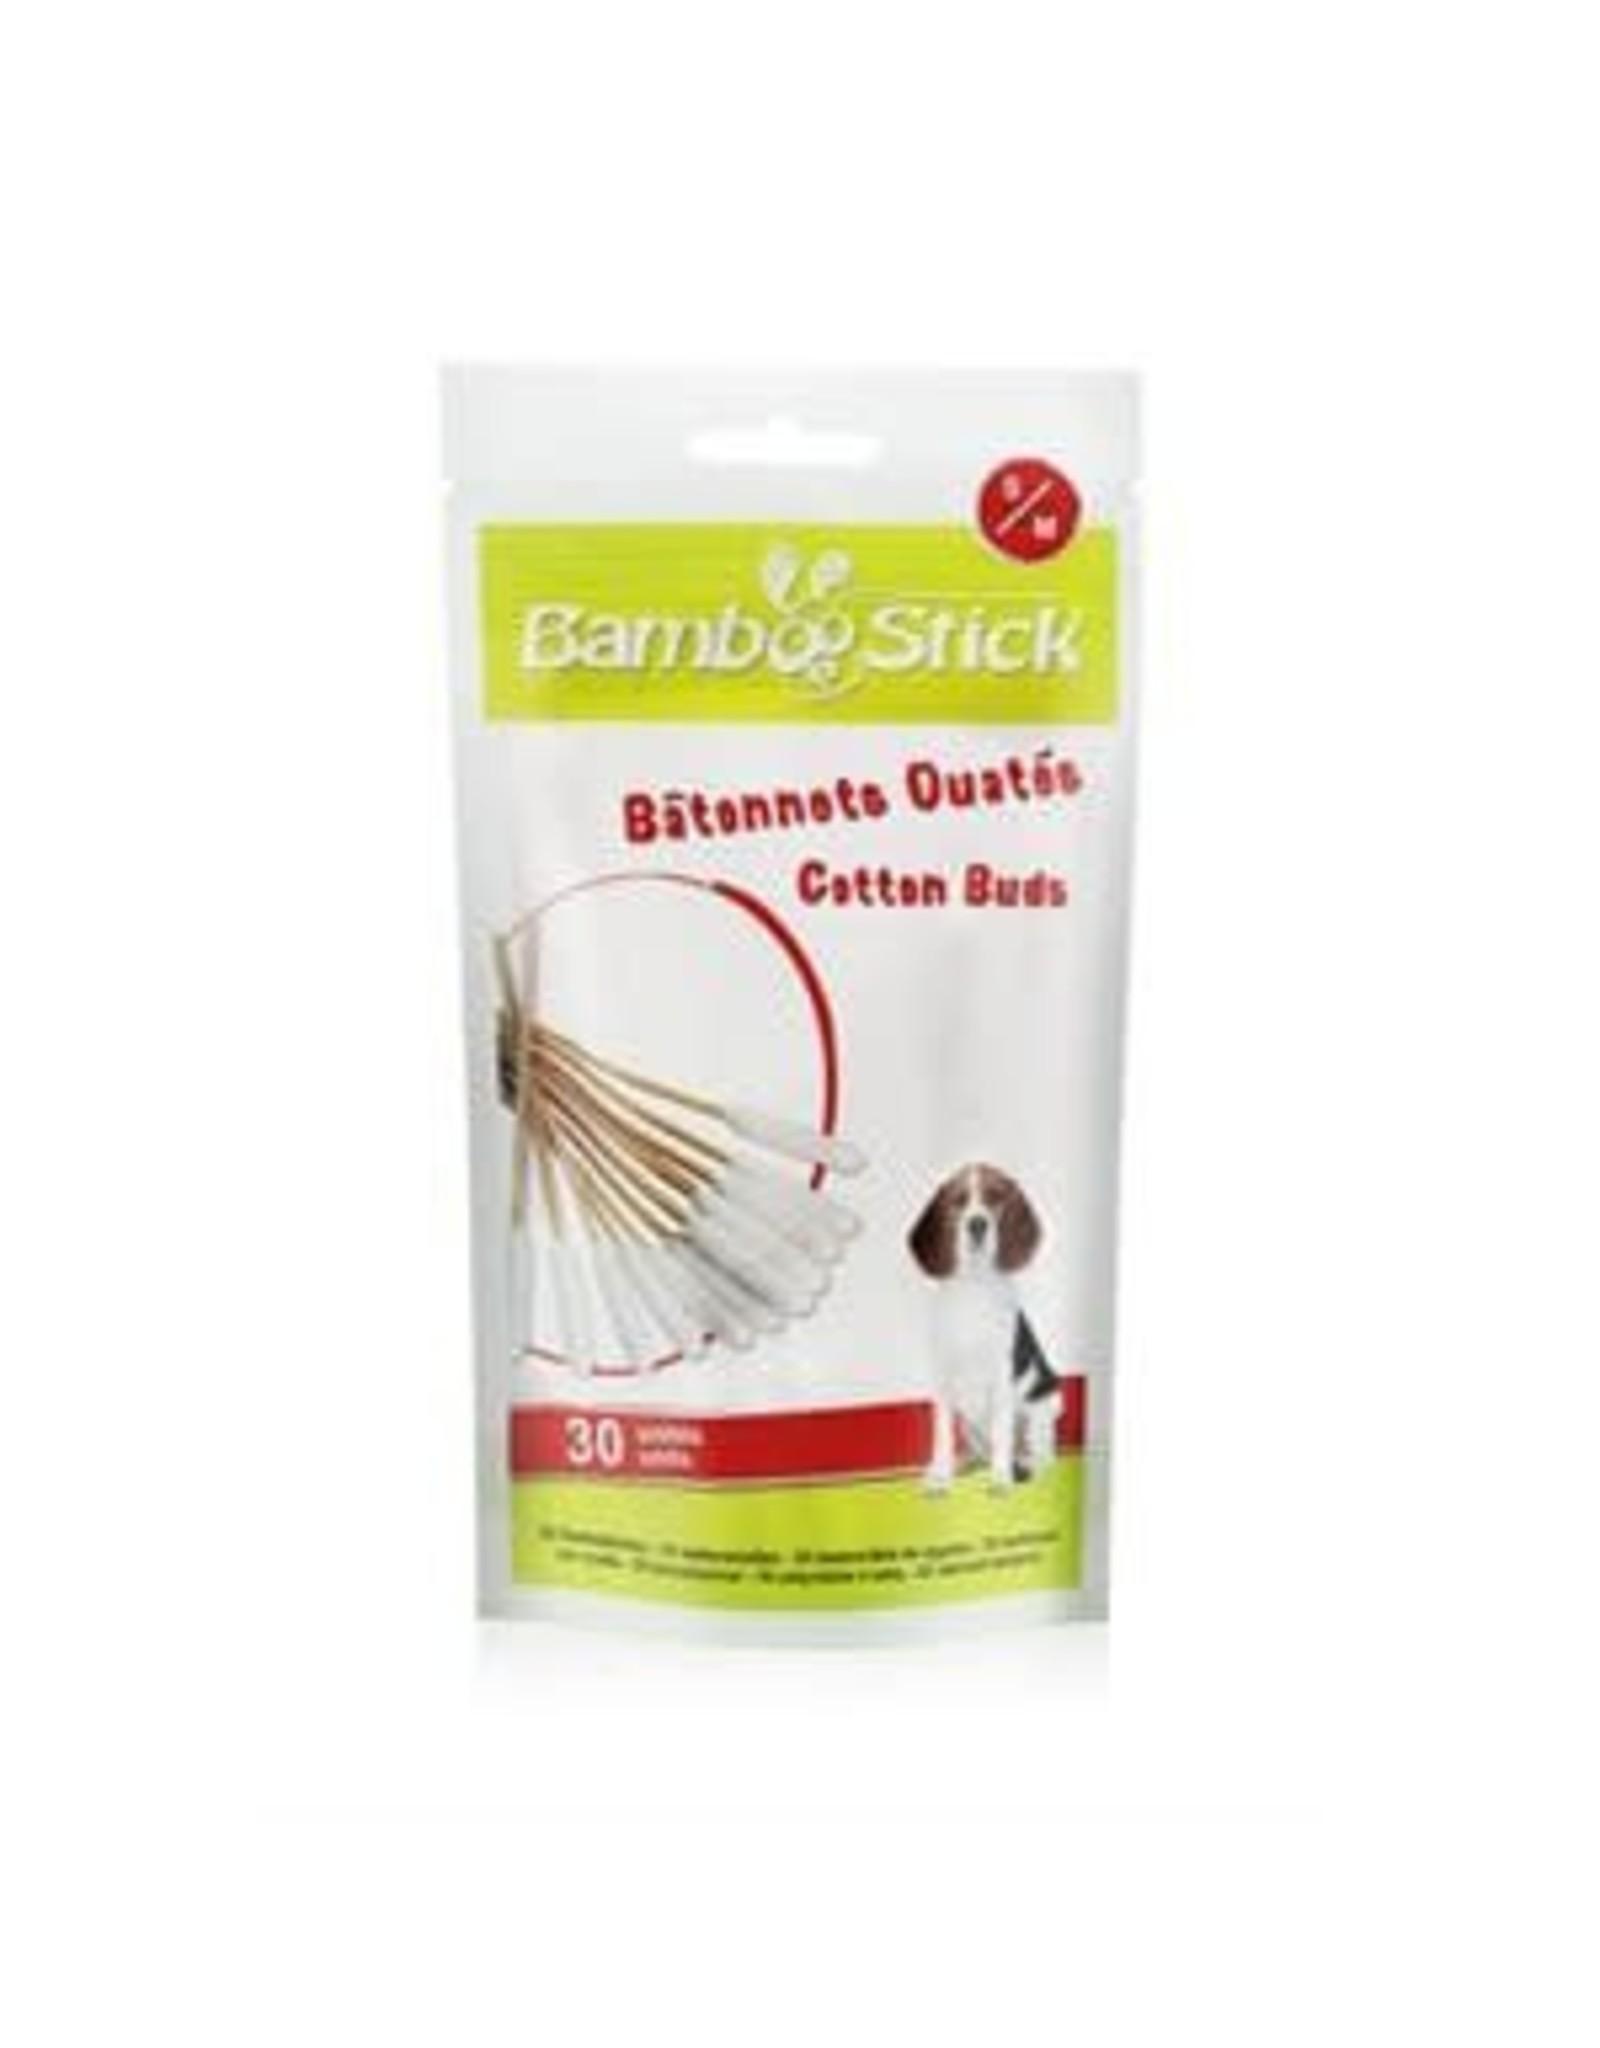 TickTwister BambooStick Cotton Buds Sm/Med 30pk